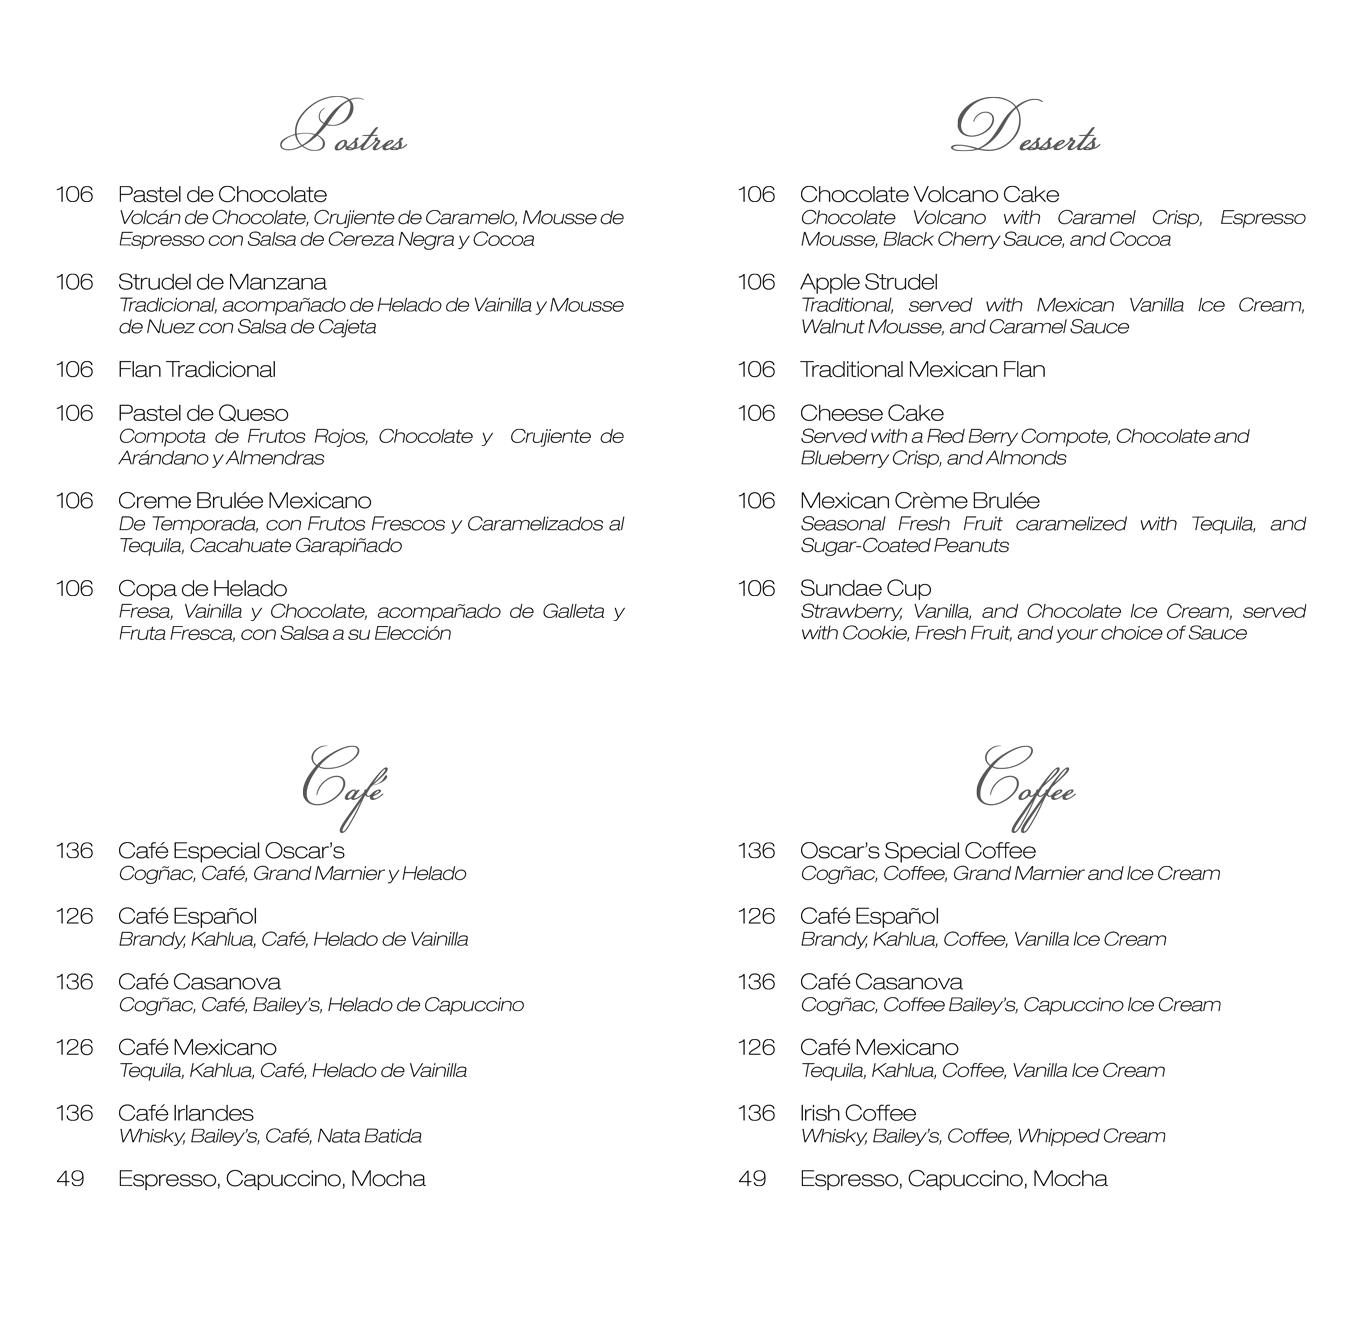 Restaurant Oscars-menu-postres-cafes